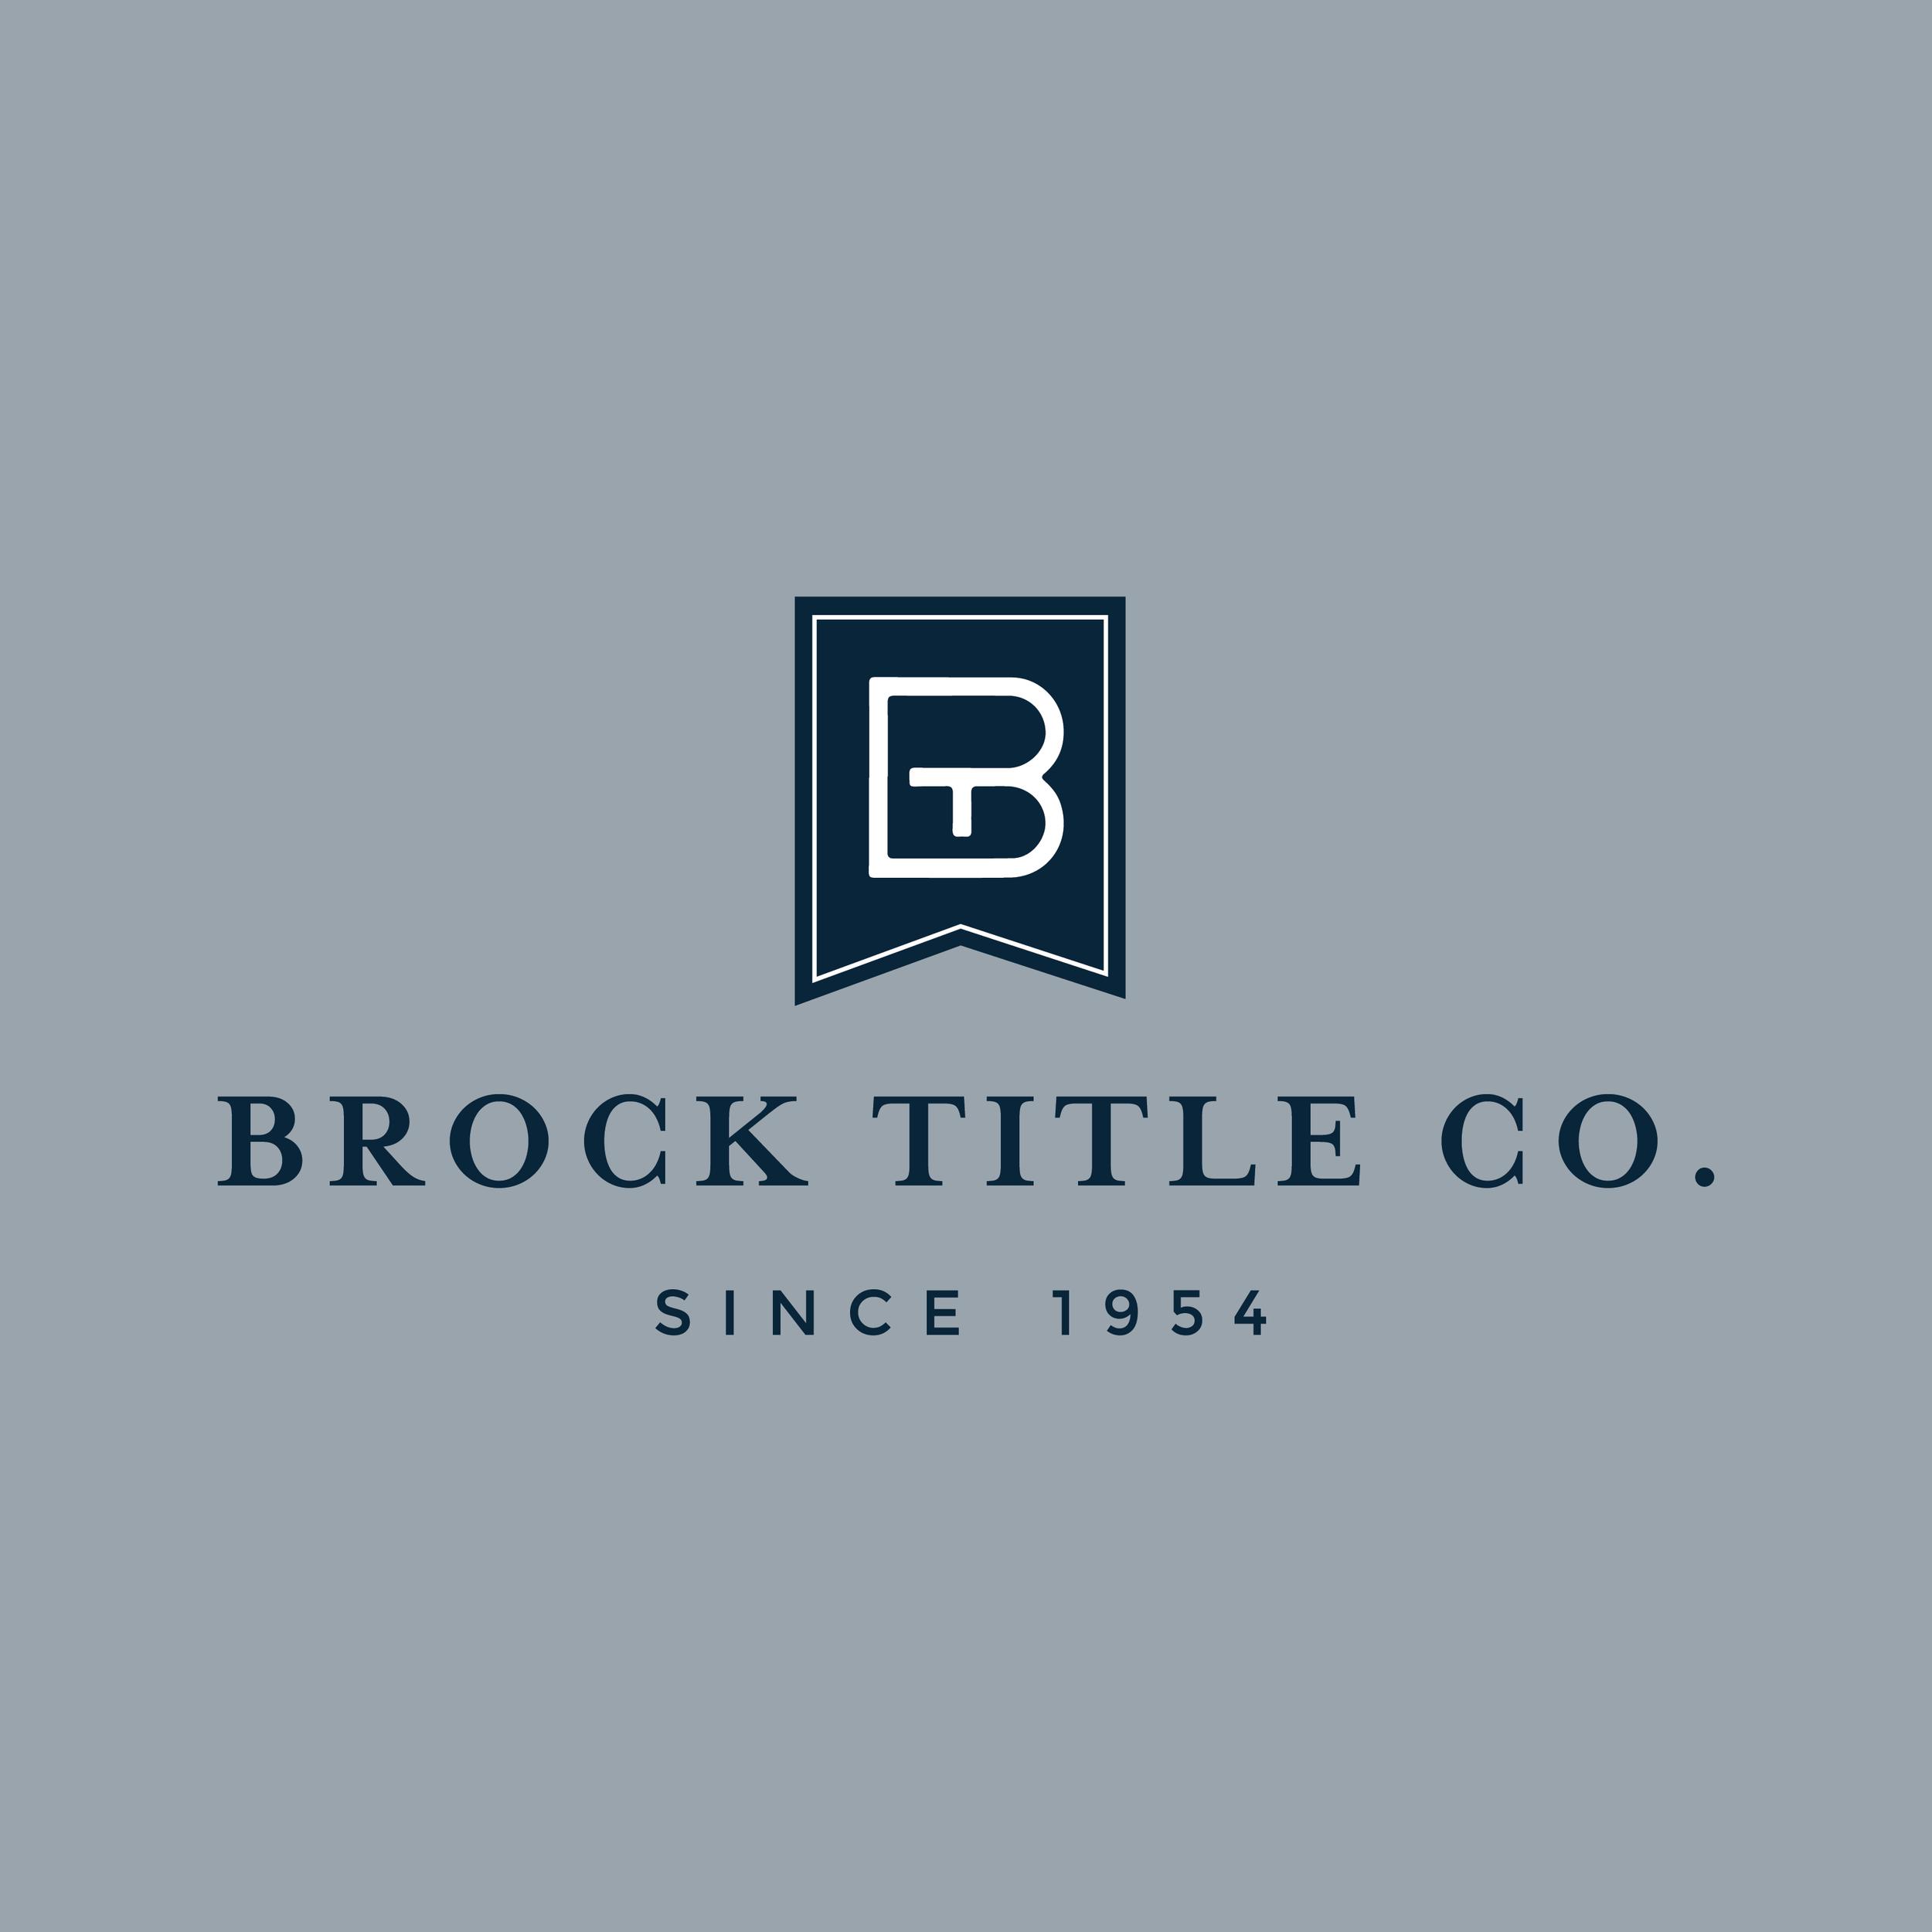 B  rock Title Co.    b  rand // print // signage